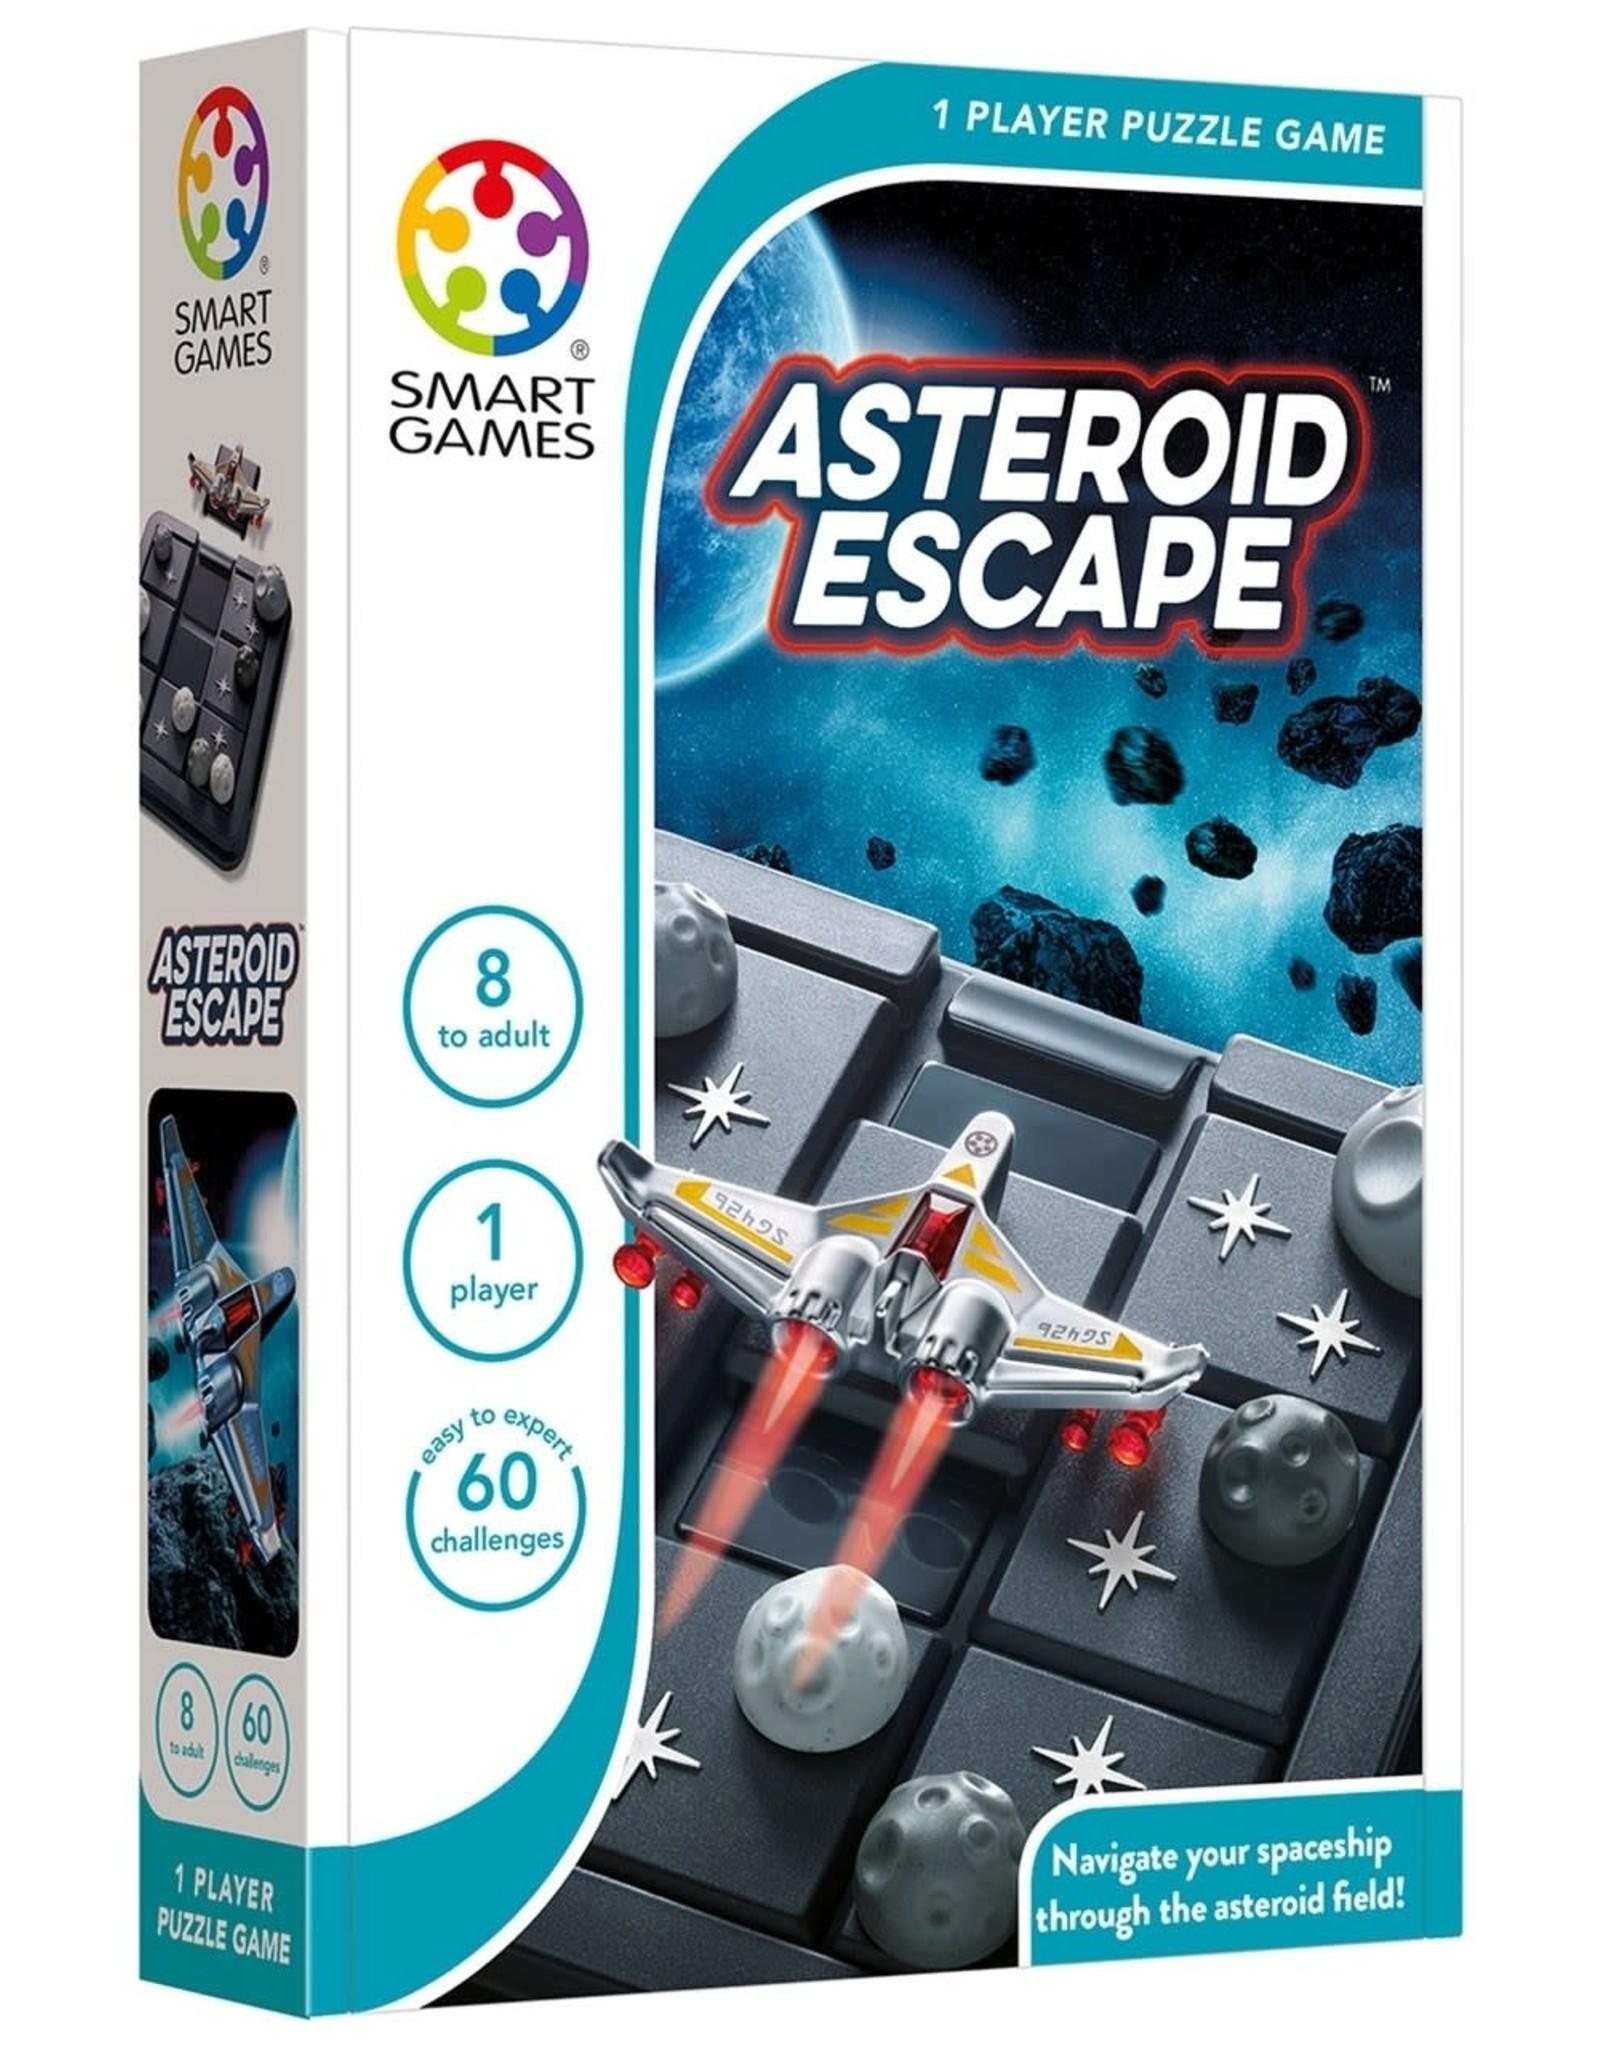 SmartGames Smart Games Compact - Asteroid Escape